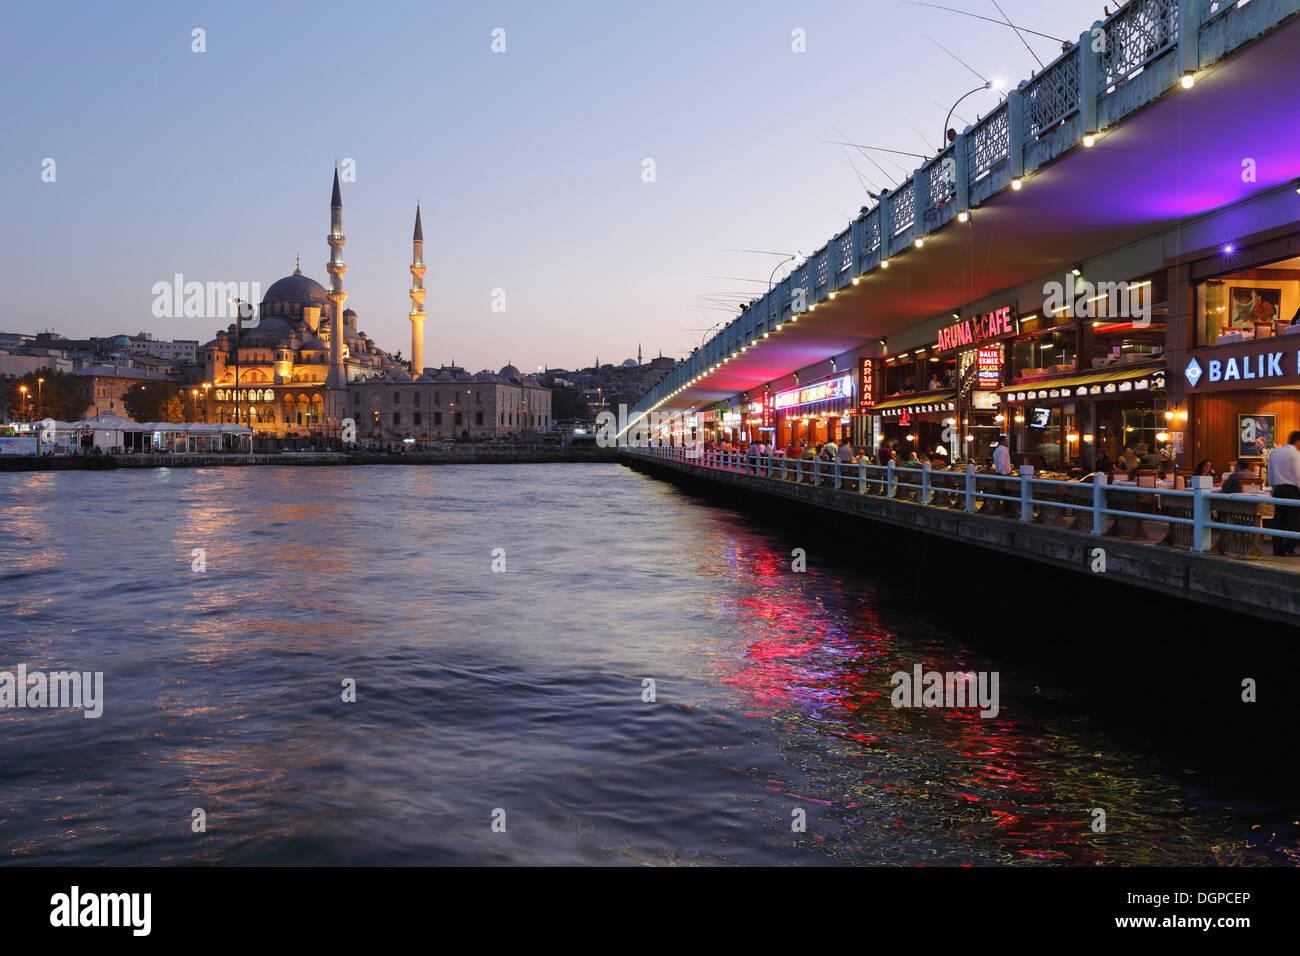 Galata Bridge, Golden Horn, New Mosque, Yeni Cami, Istanbul, european side, Turkey, Europe - Stock Image